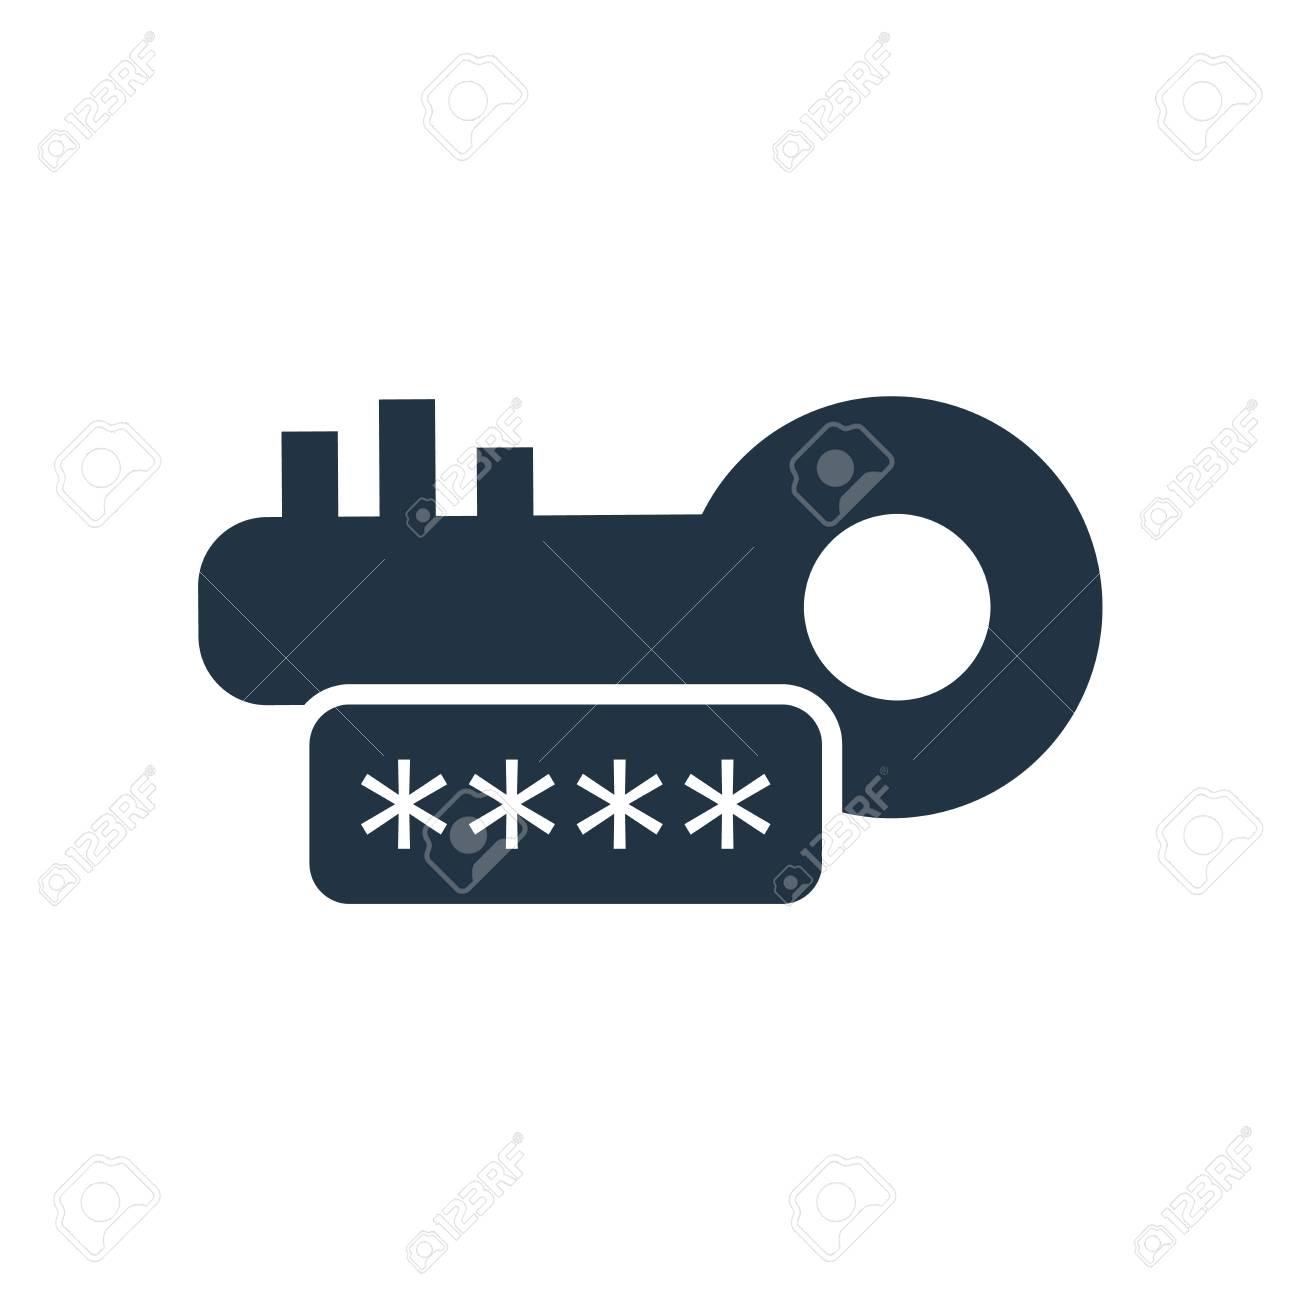 123Rf Password password icon vector isolated on white background, password